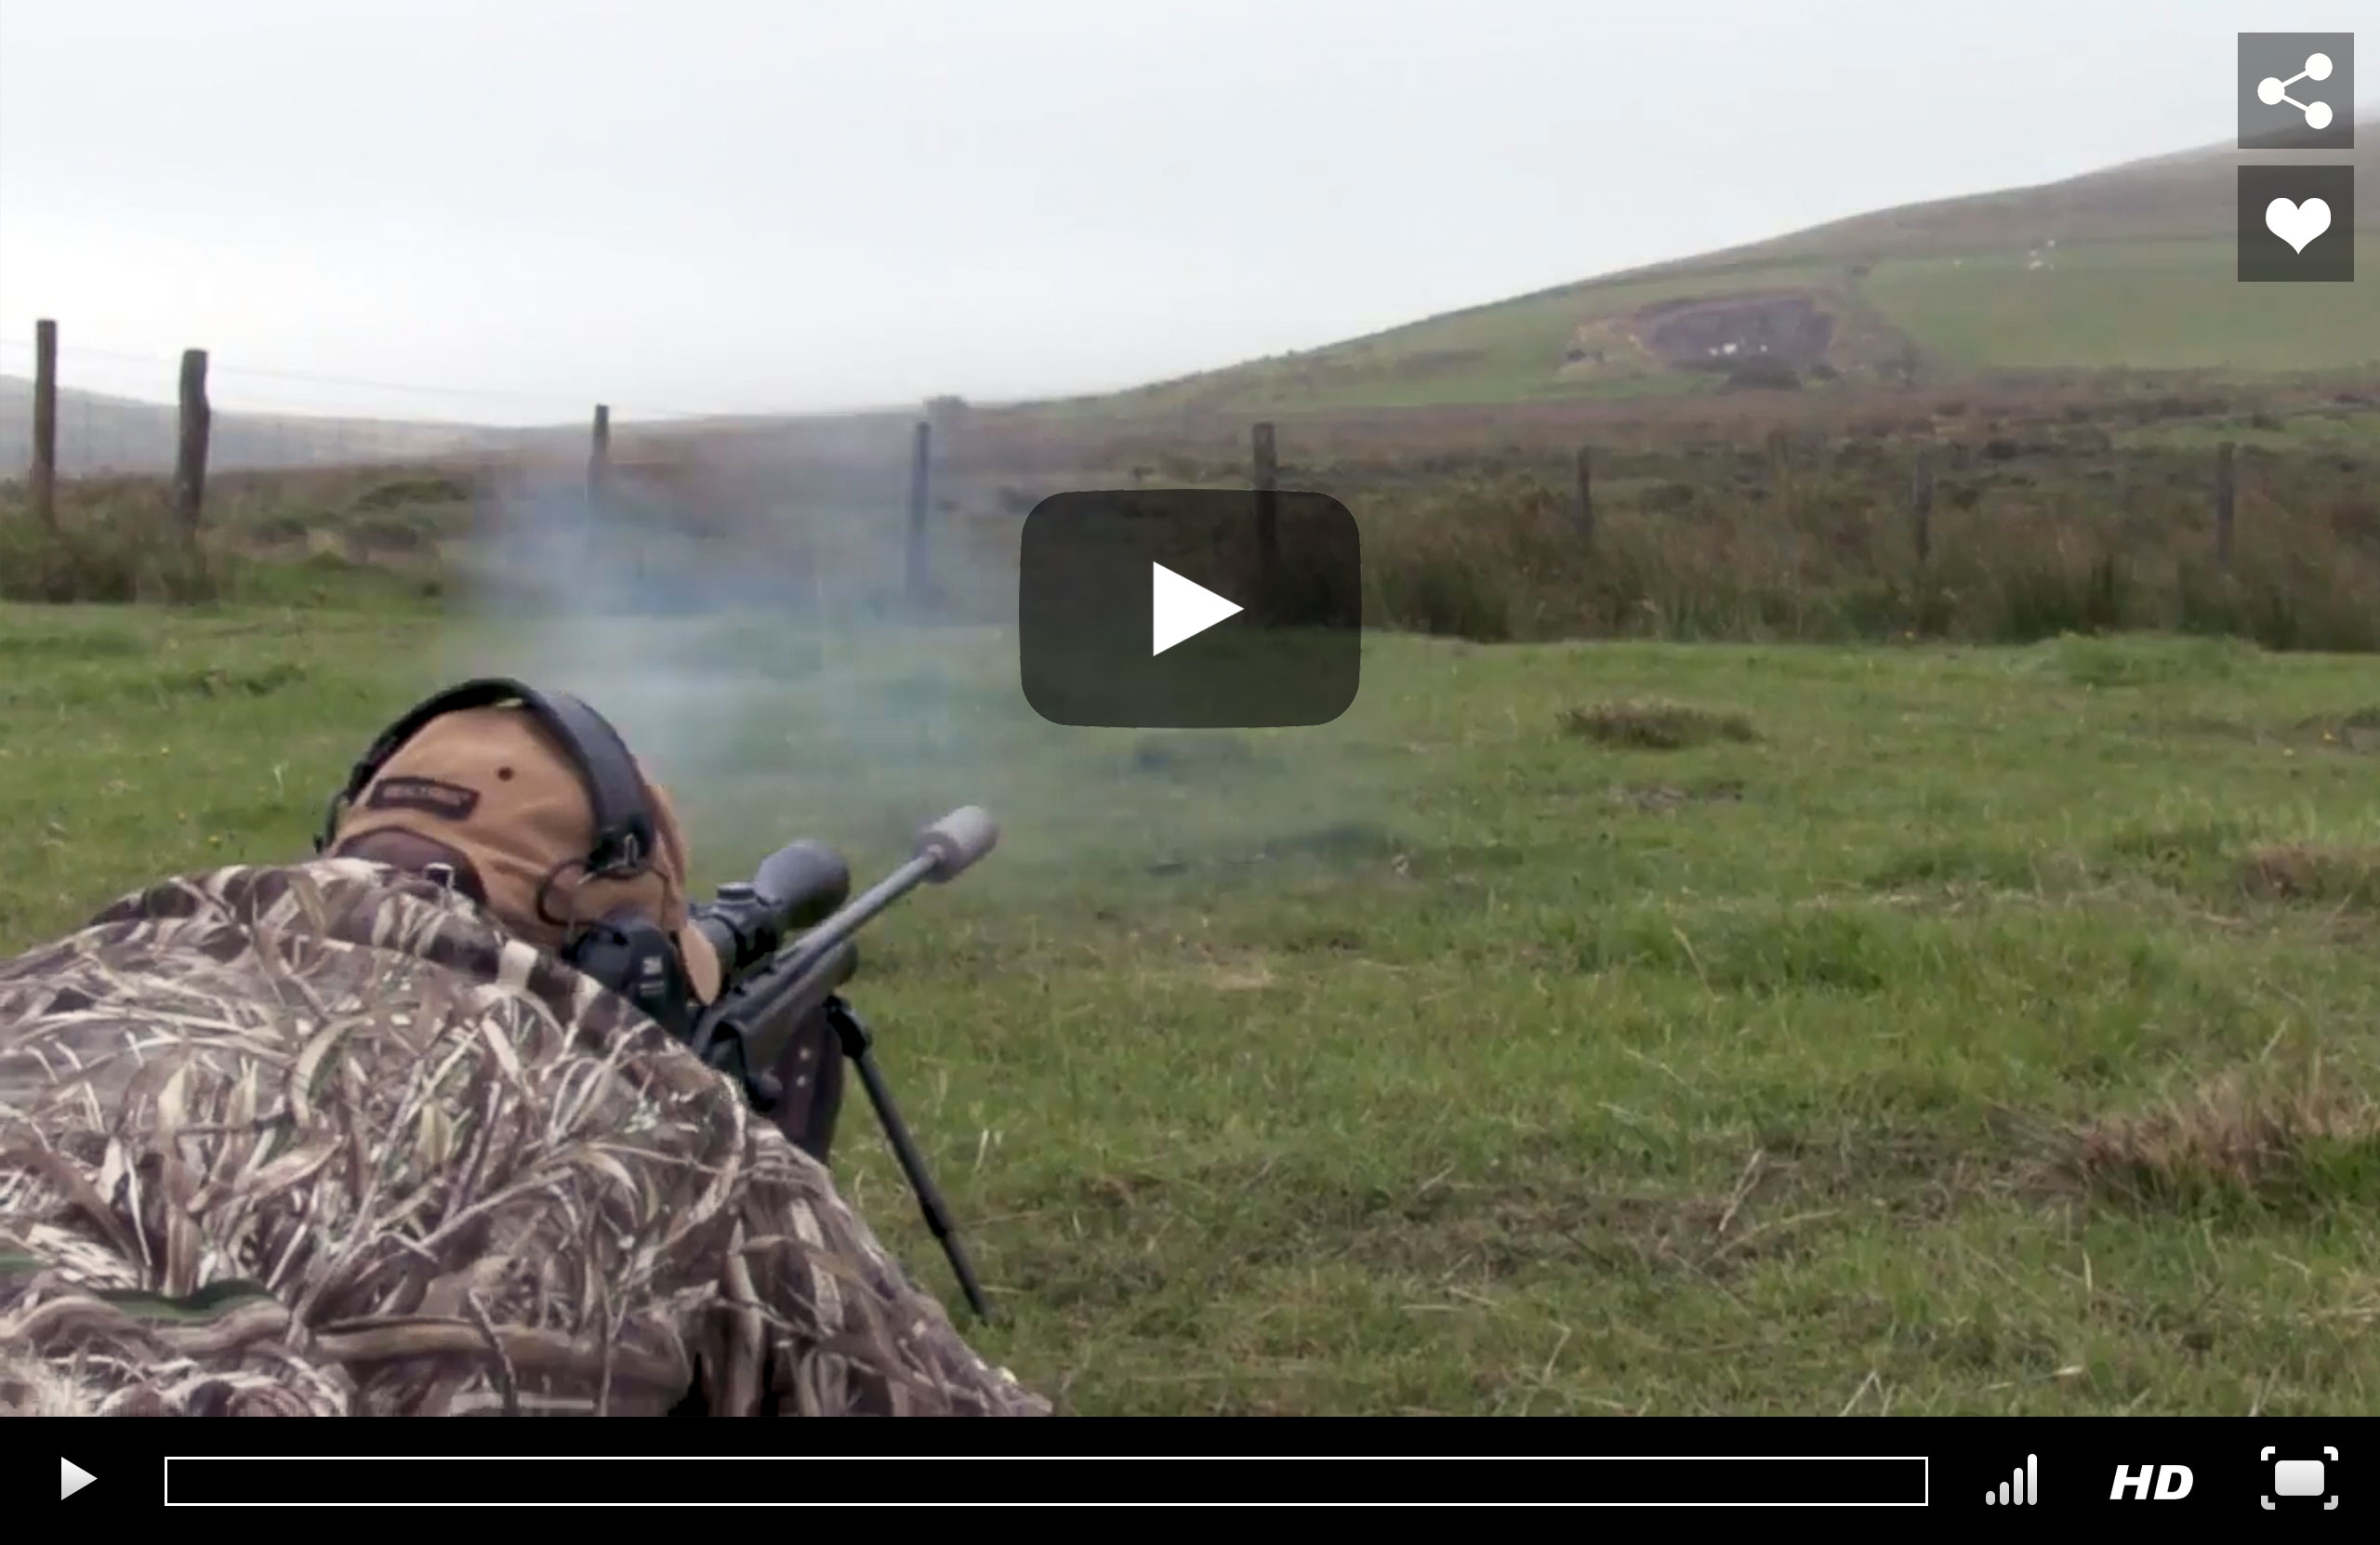 Firearms Training Long Range Shooting